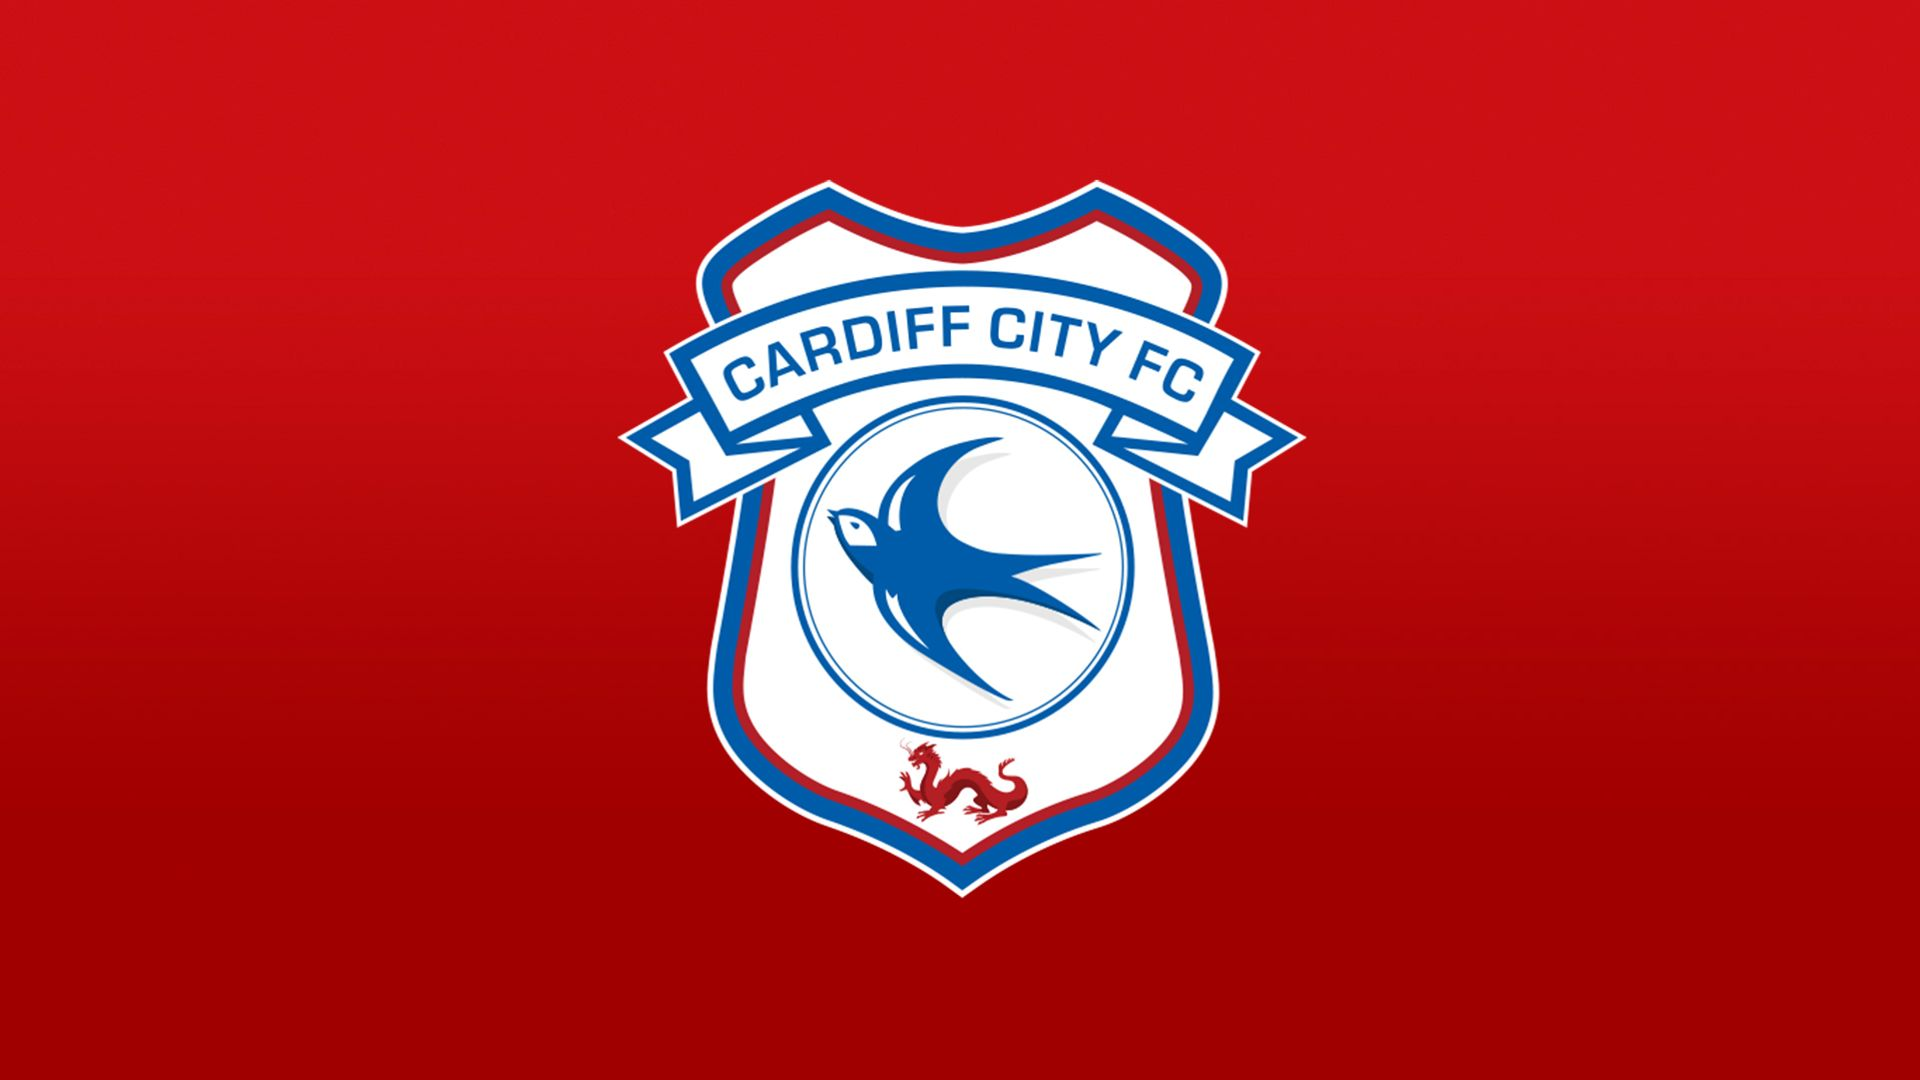 Cardiff City fixtures: Championship 2021/22